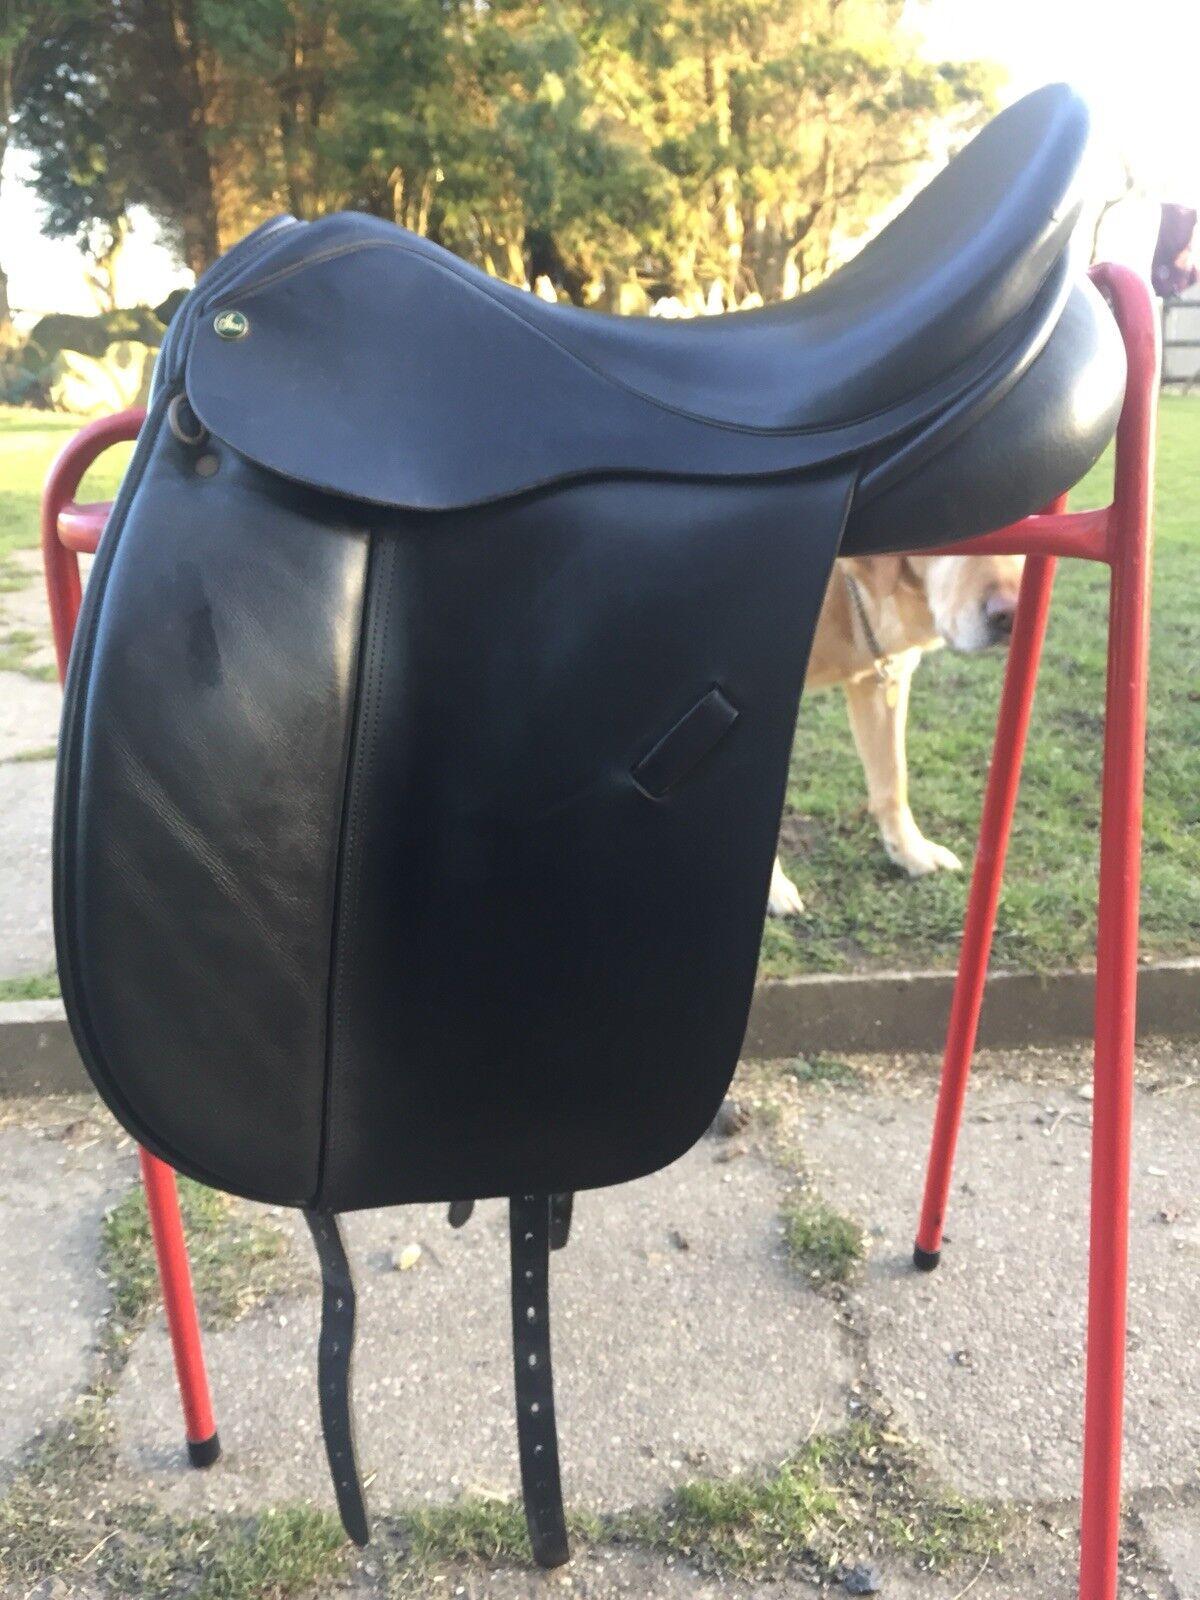 Ideal jessica dressage saddle 17.5 inch MW